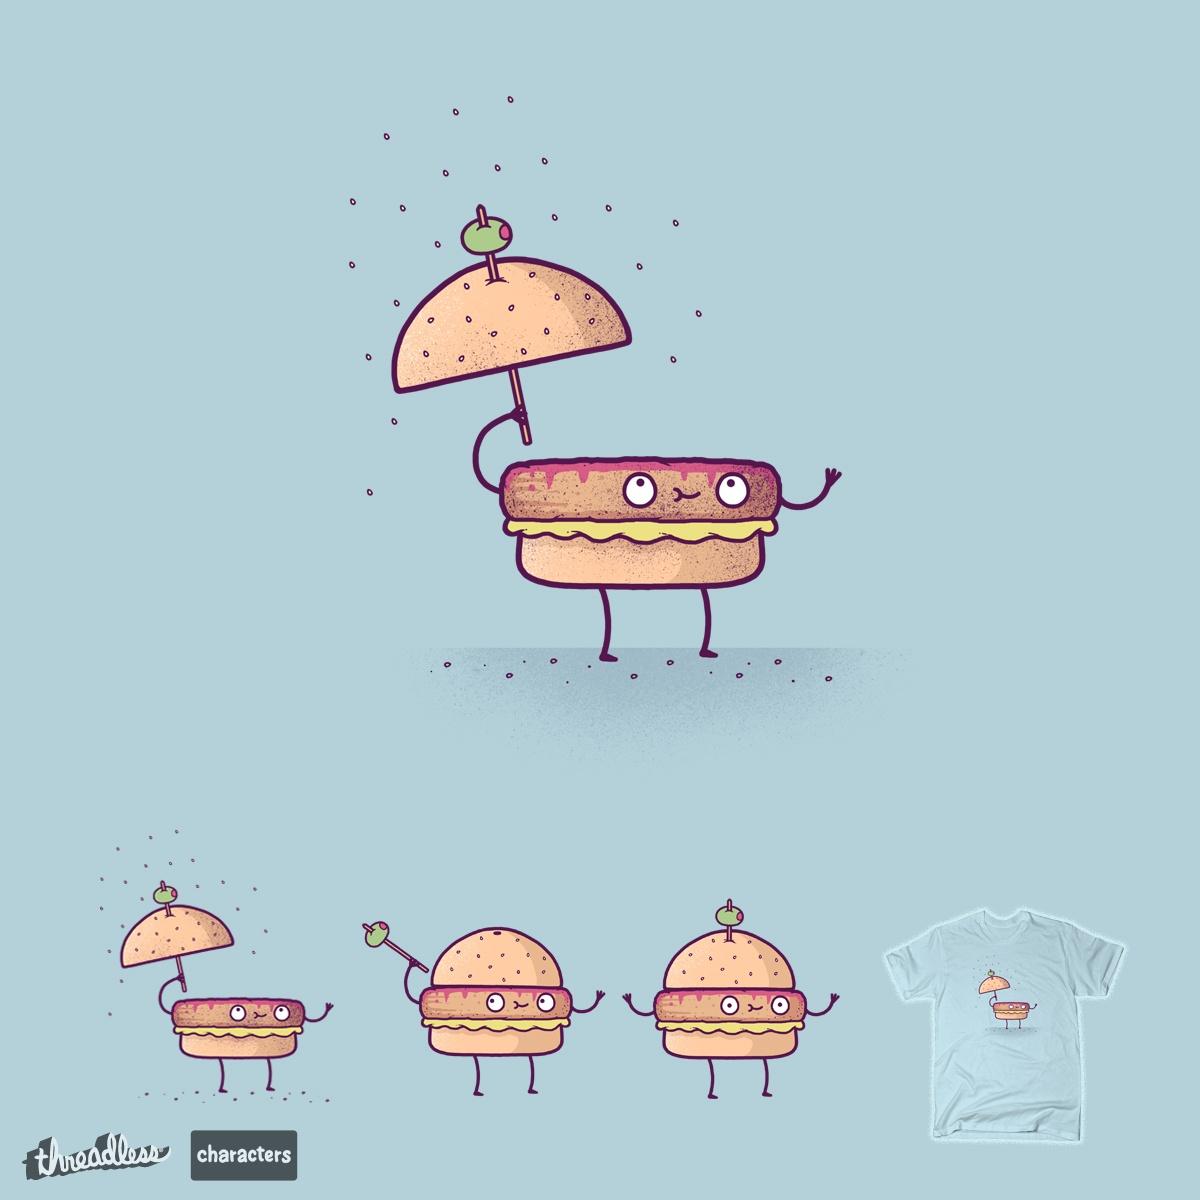 Burgerbrella by randyotter3000 on Threadless